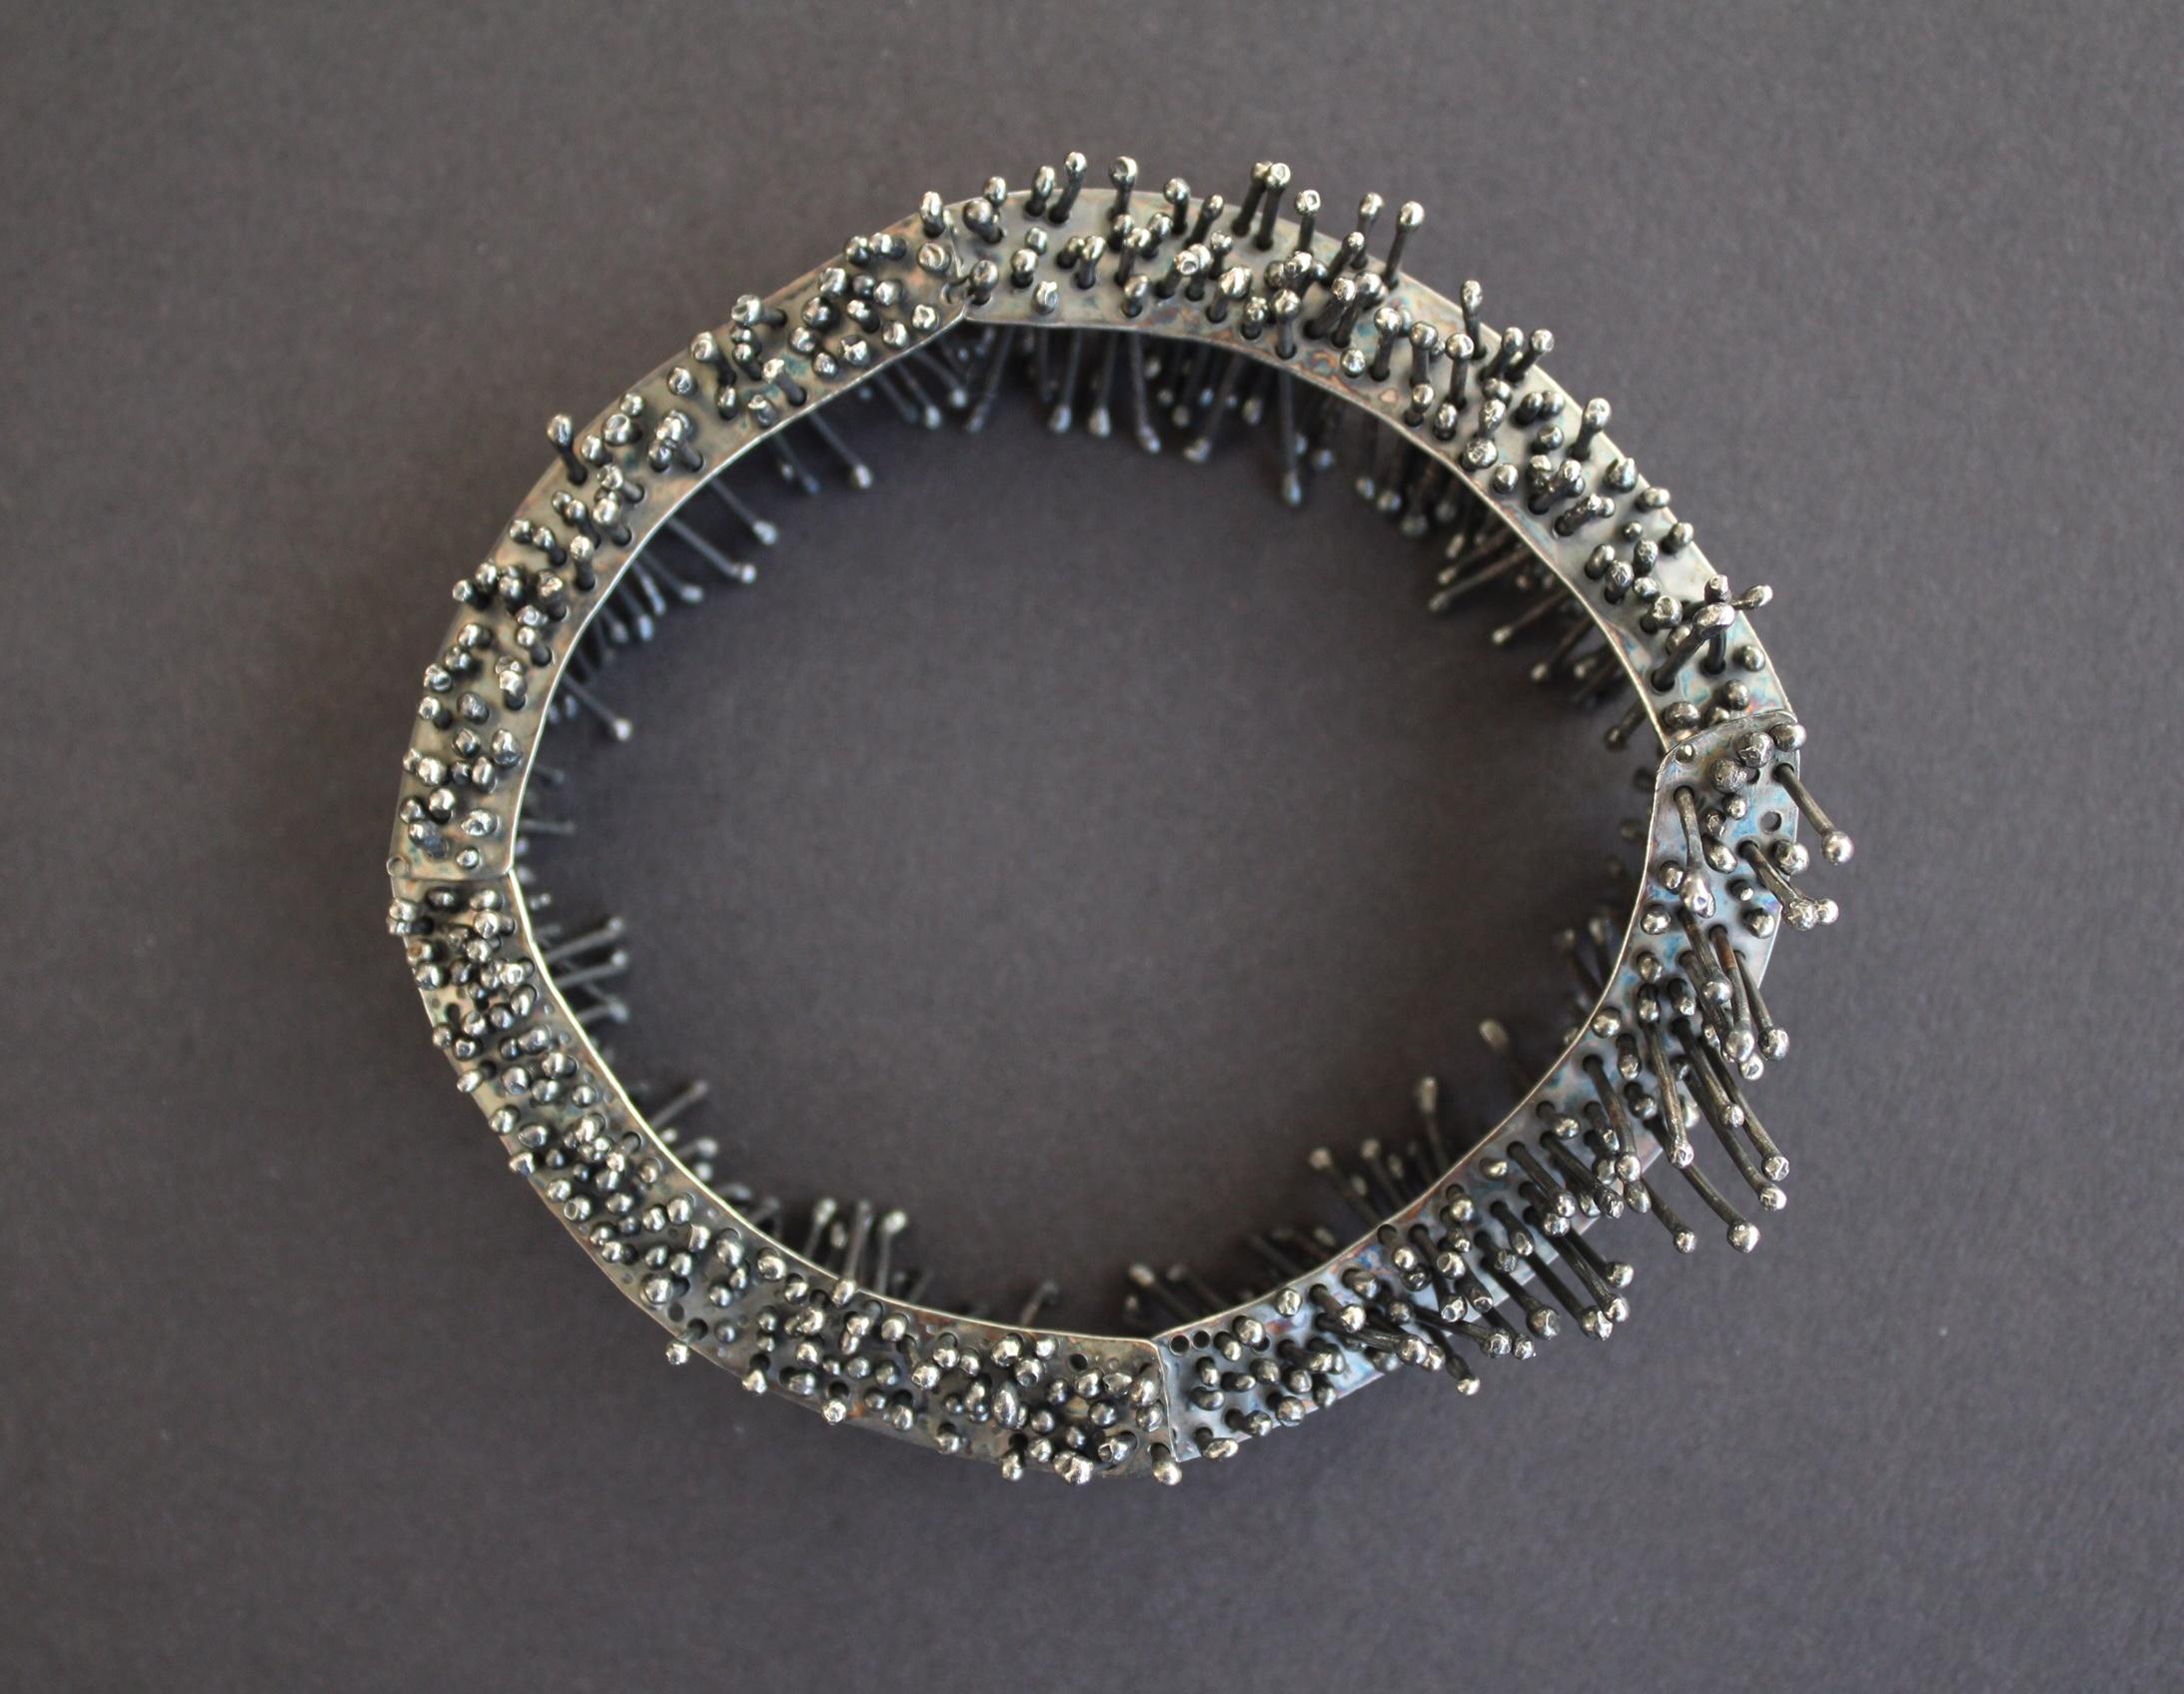 Oxidised Silver Bangle